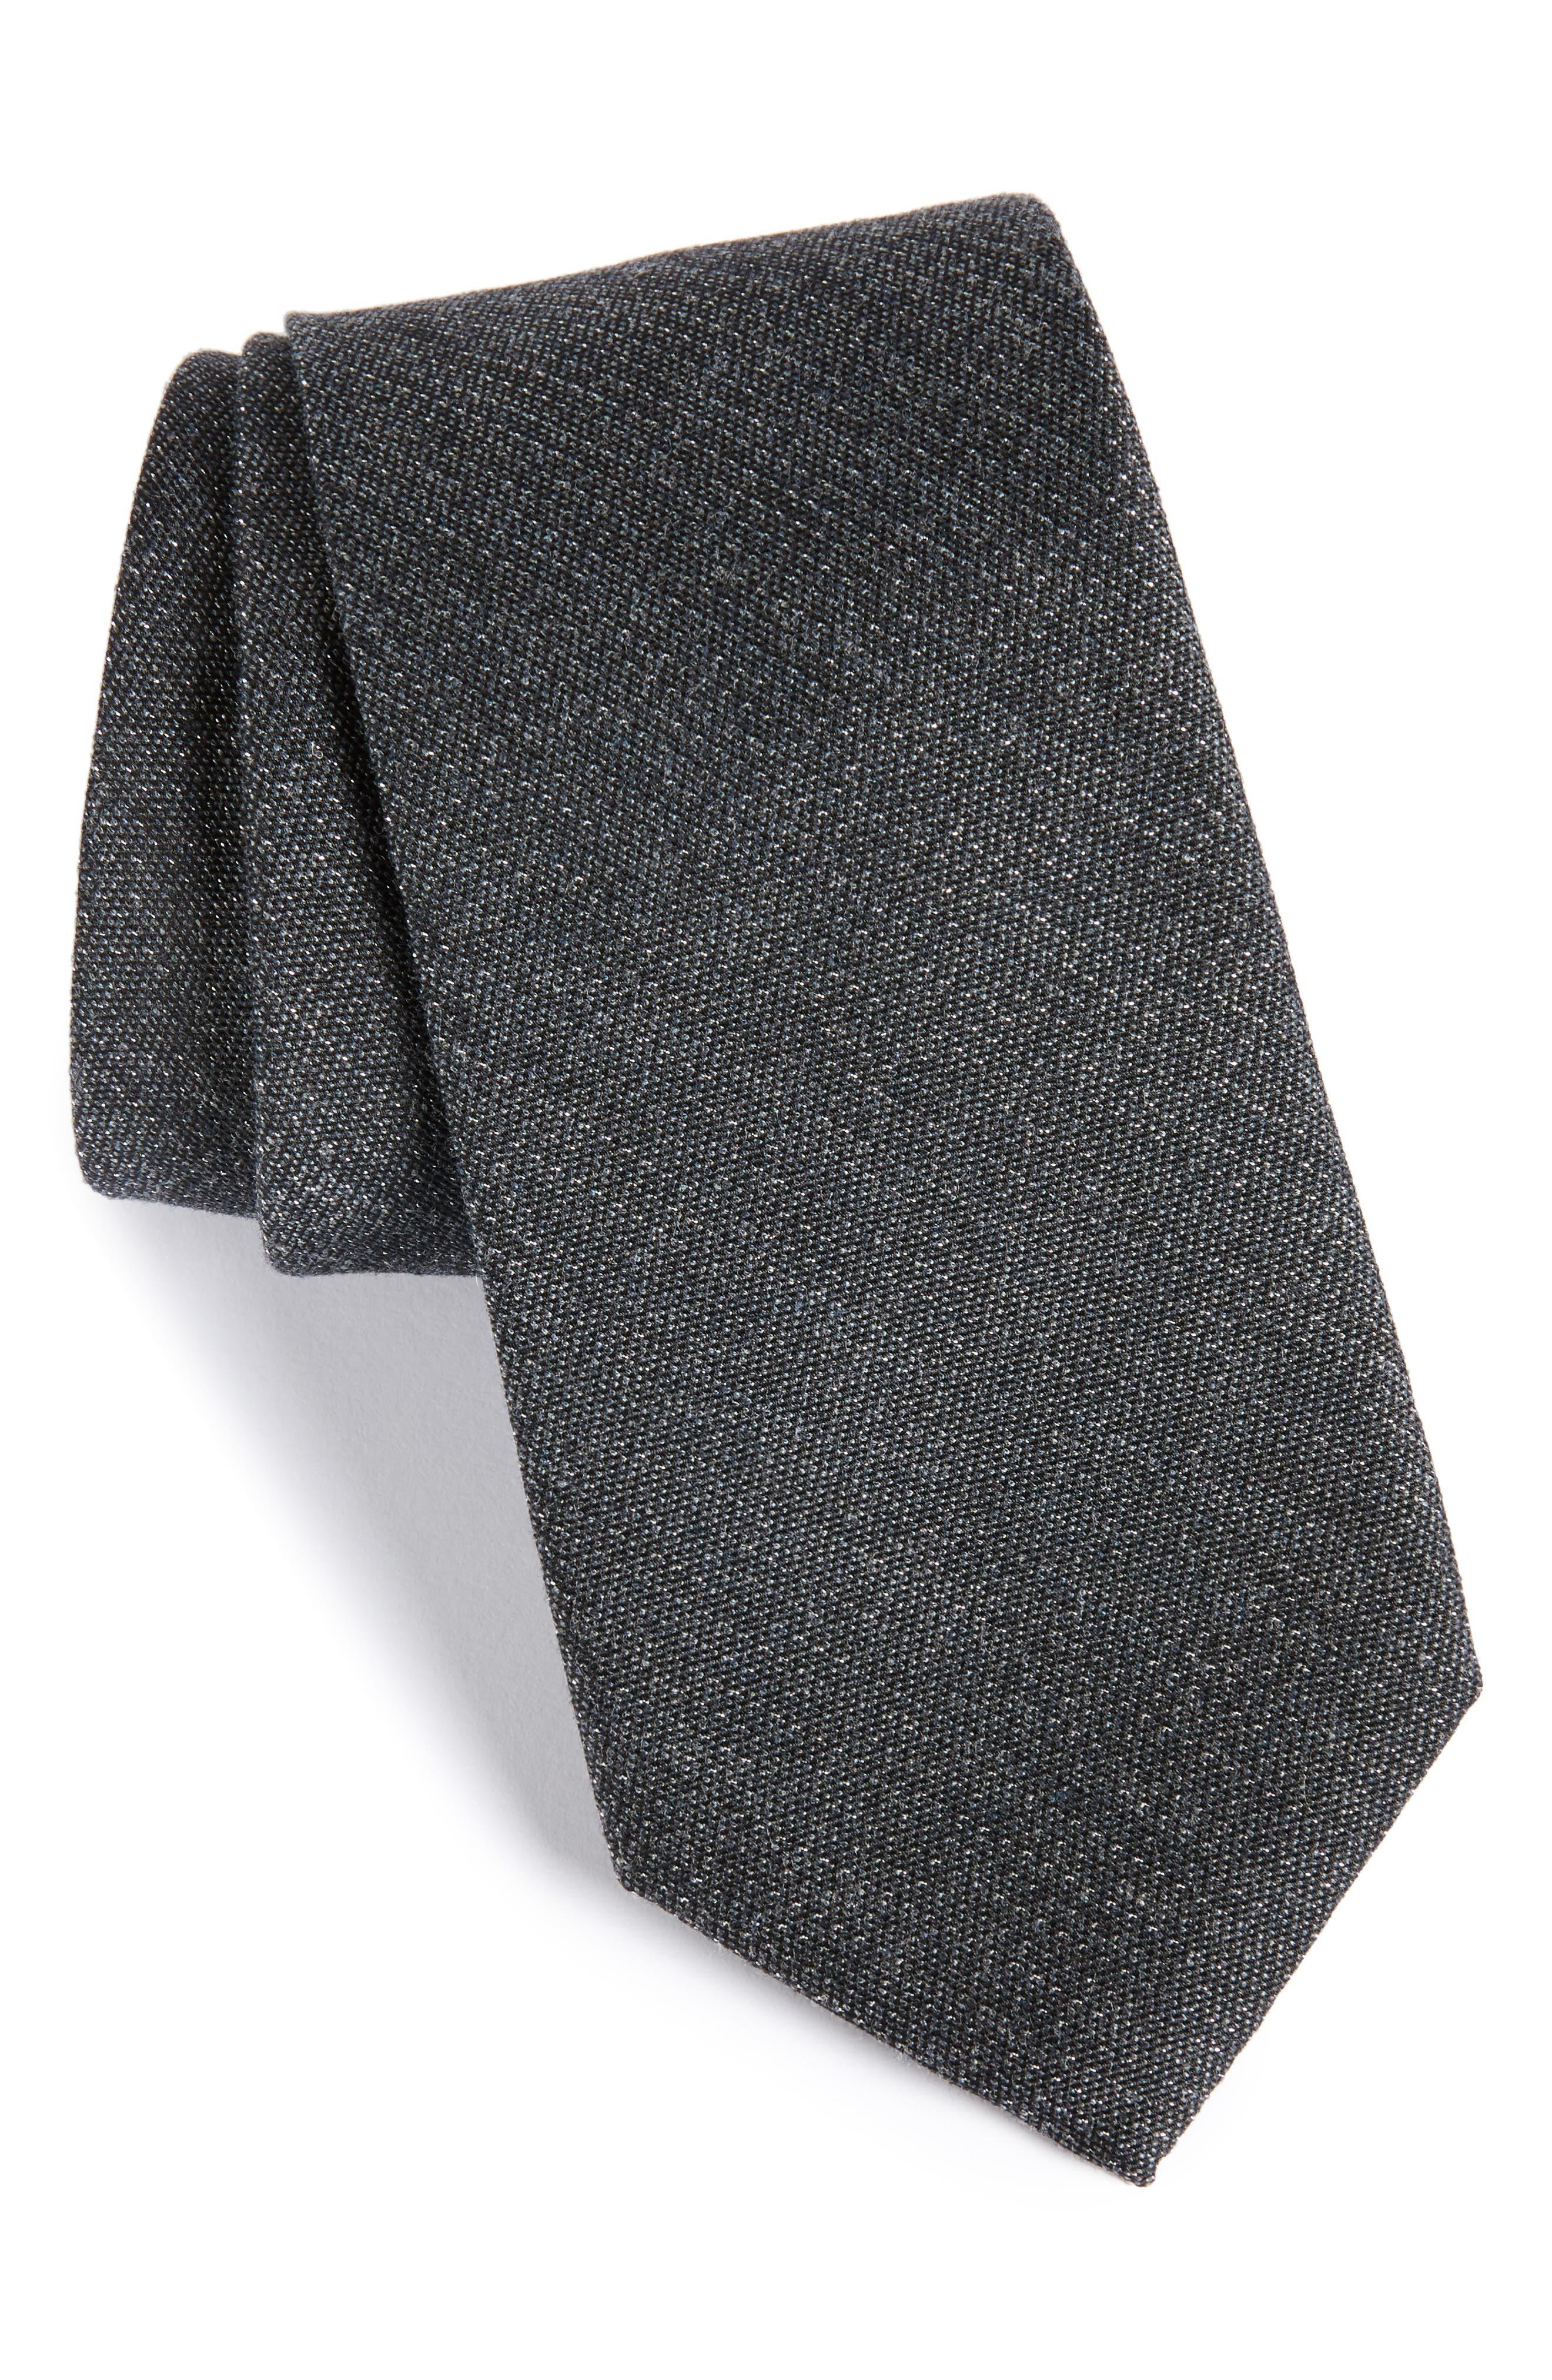 Resolution Silk Blend Tie,                         Main,                         color, 001